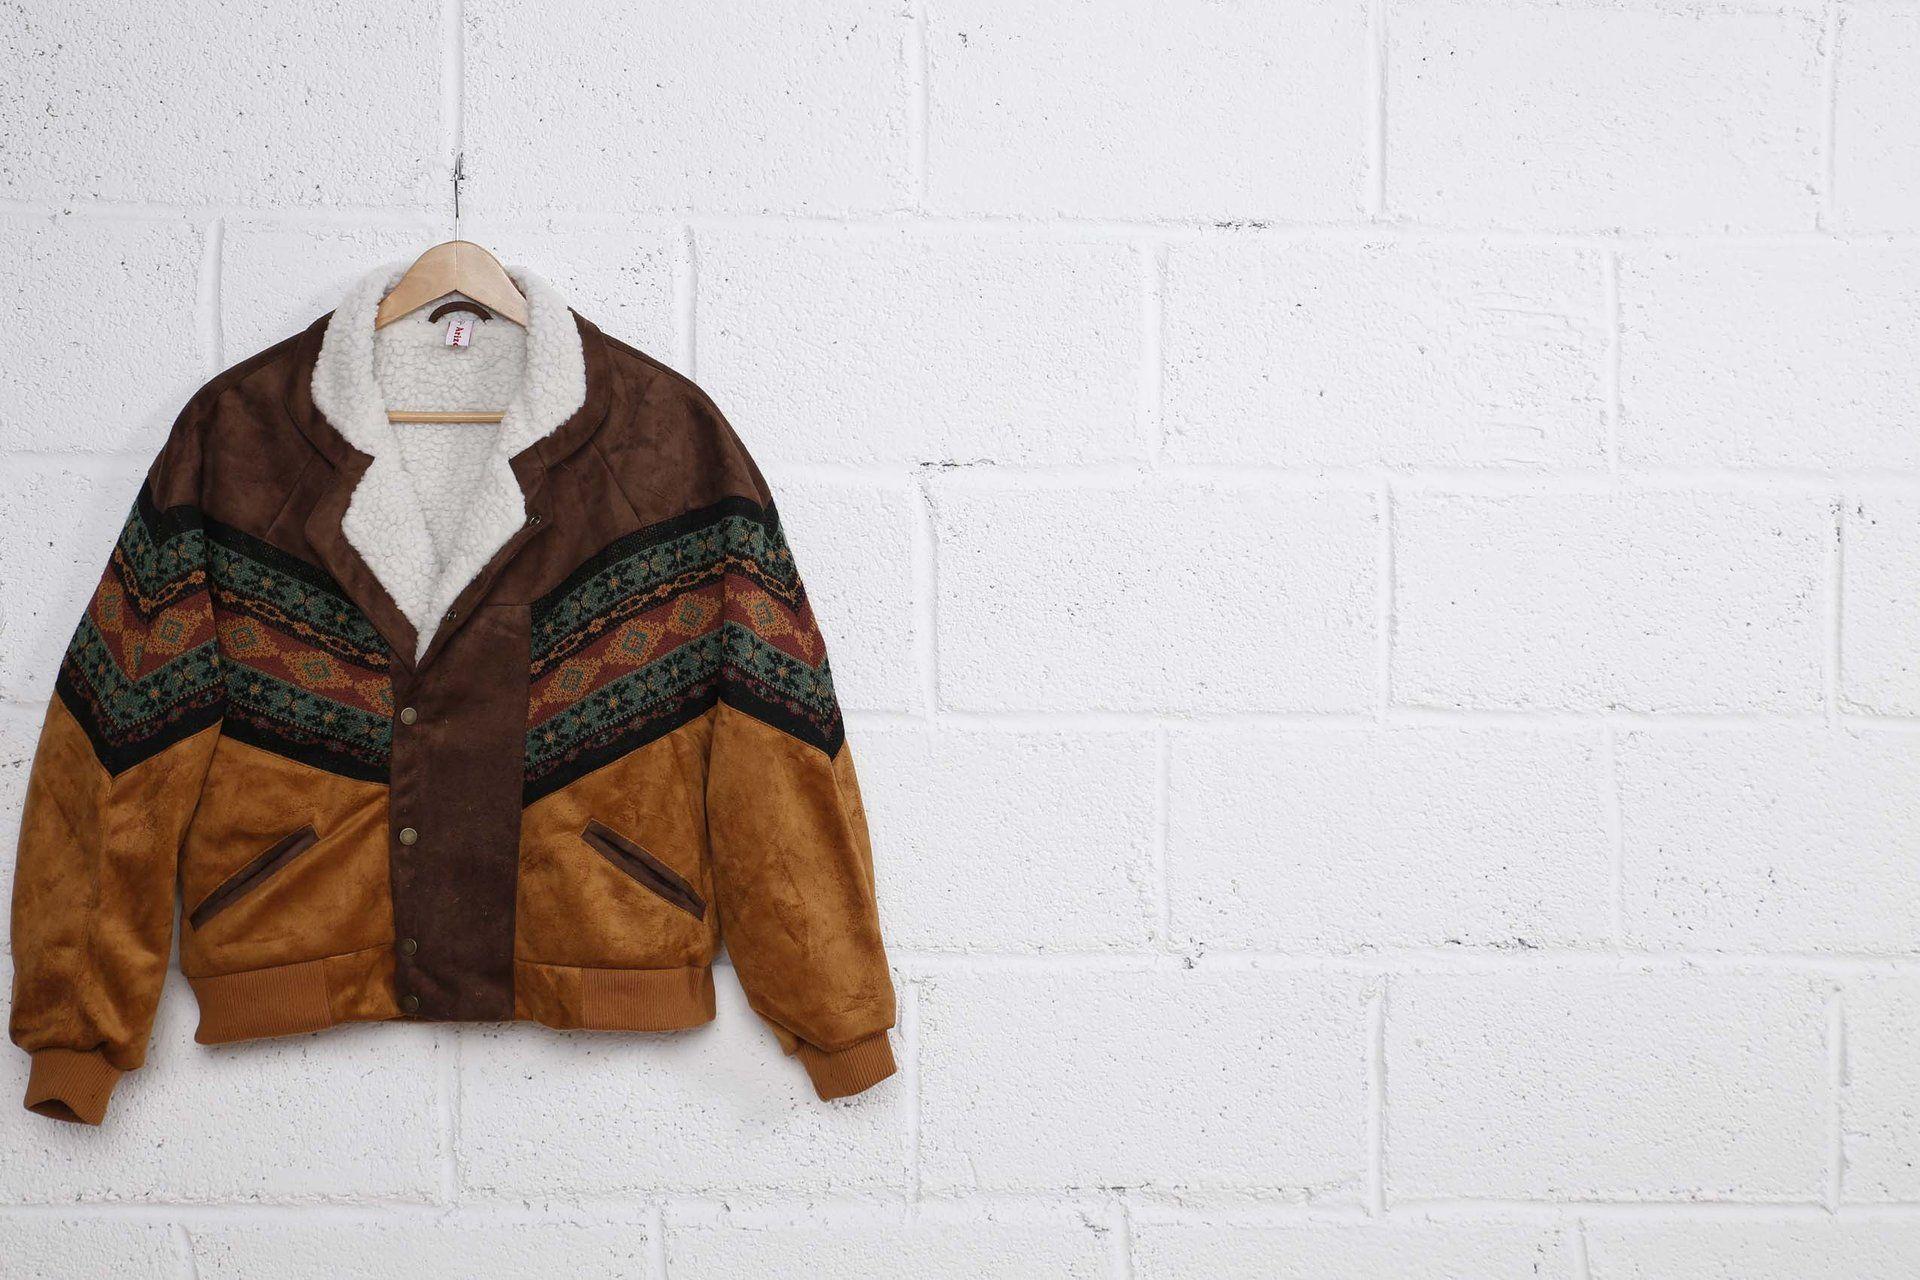 Arizona Babe Navajo Bomber Clothes Fashion Clothes Inspiration [ 1280 x 1920 Pixel ]